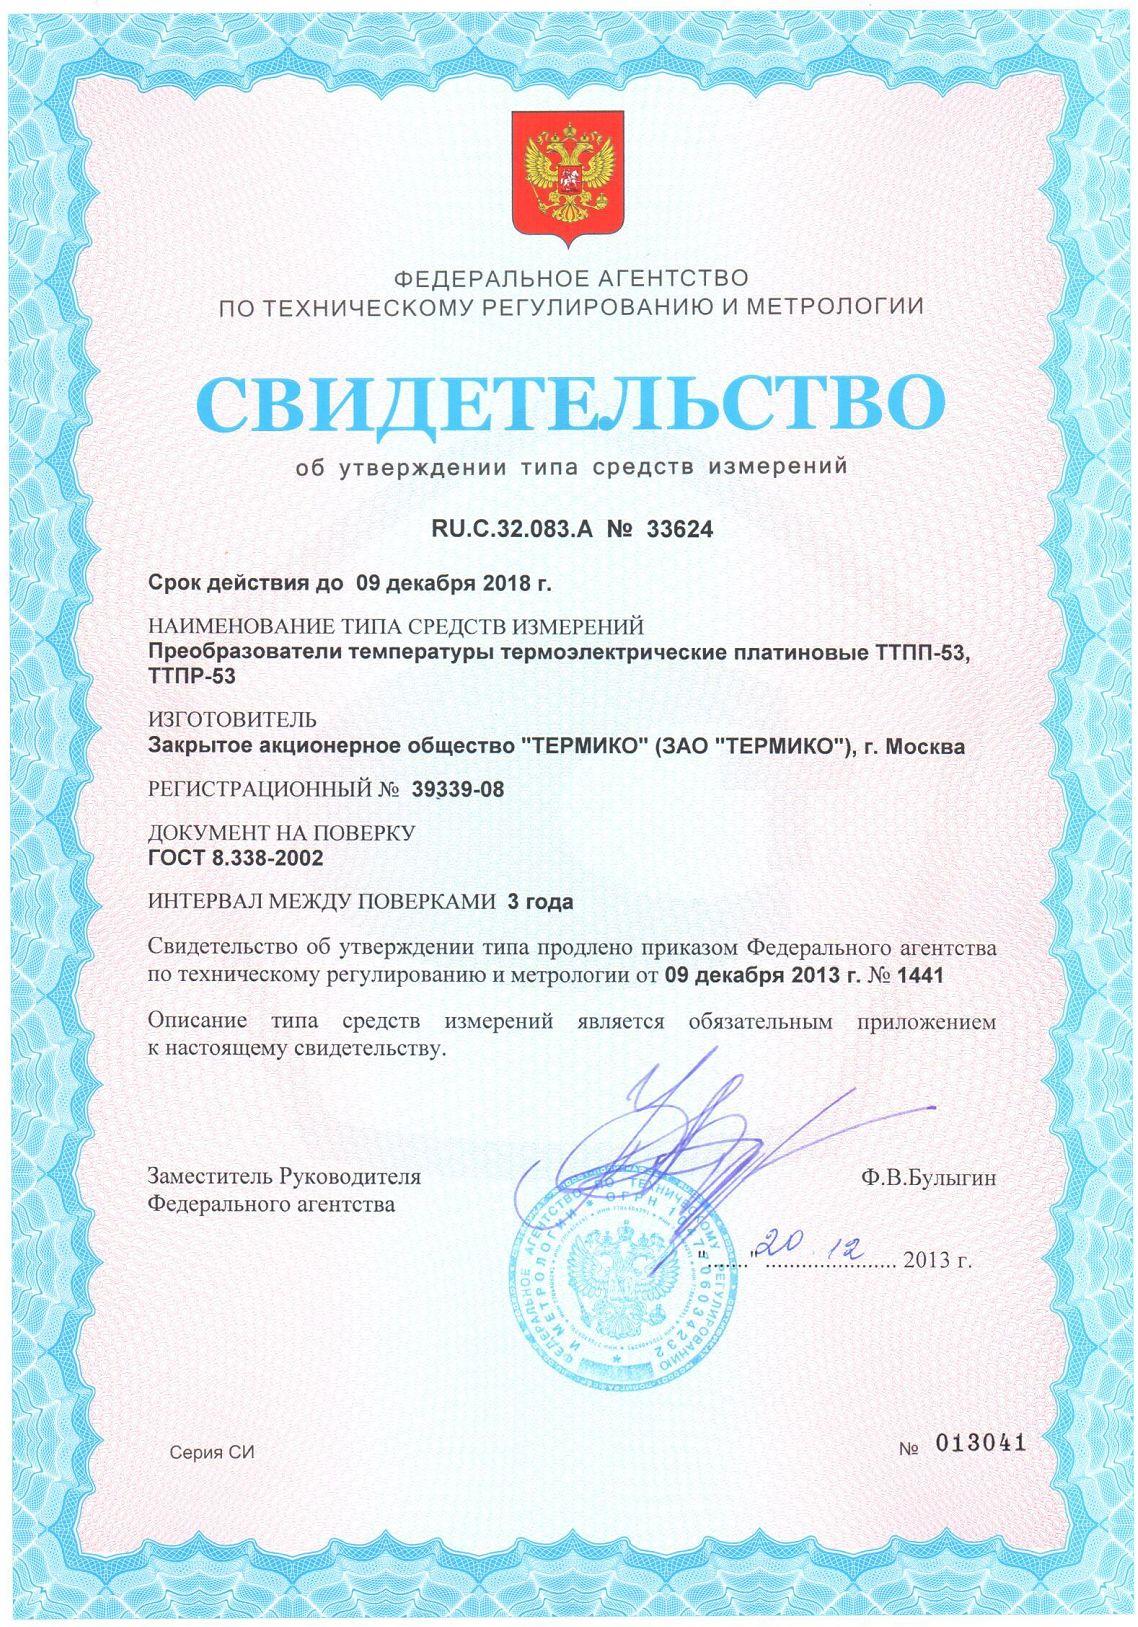 Сертификат №23913-02